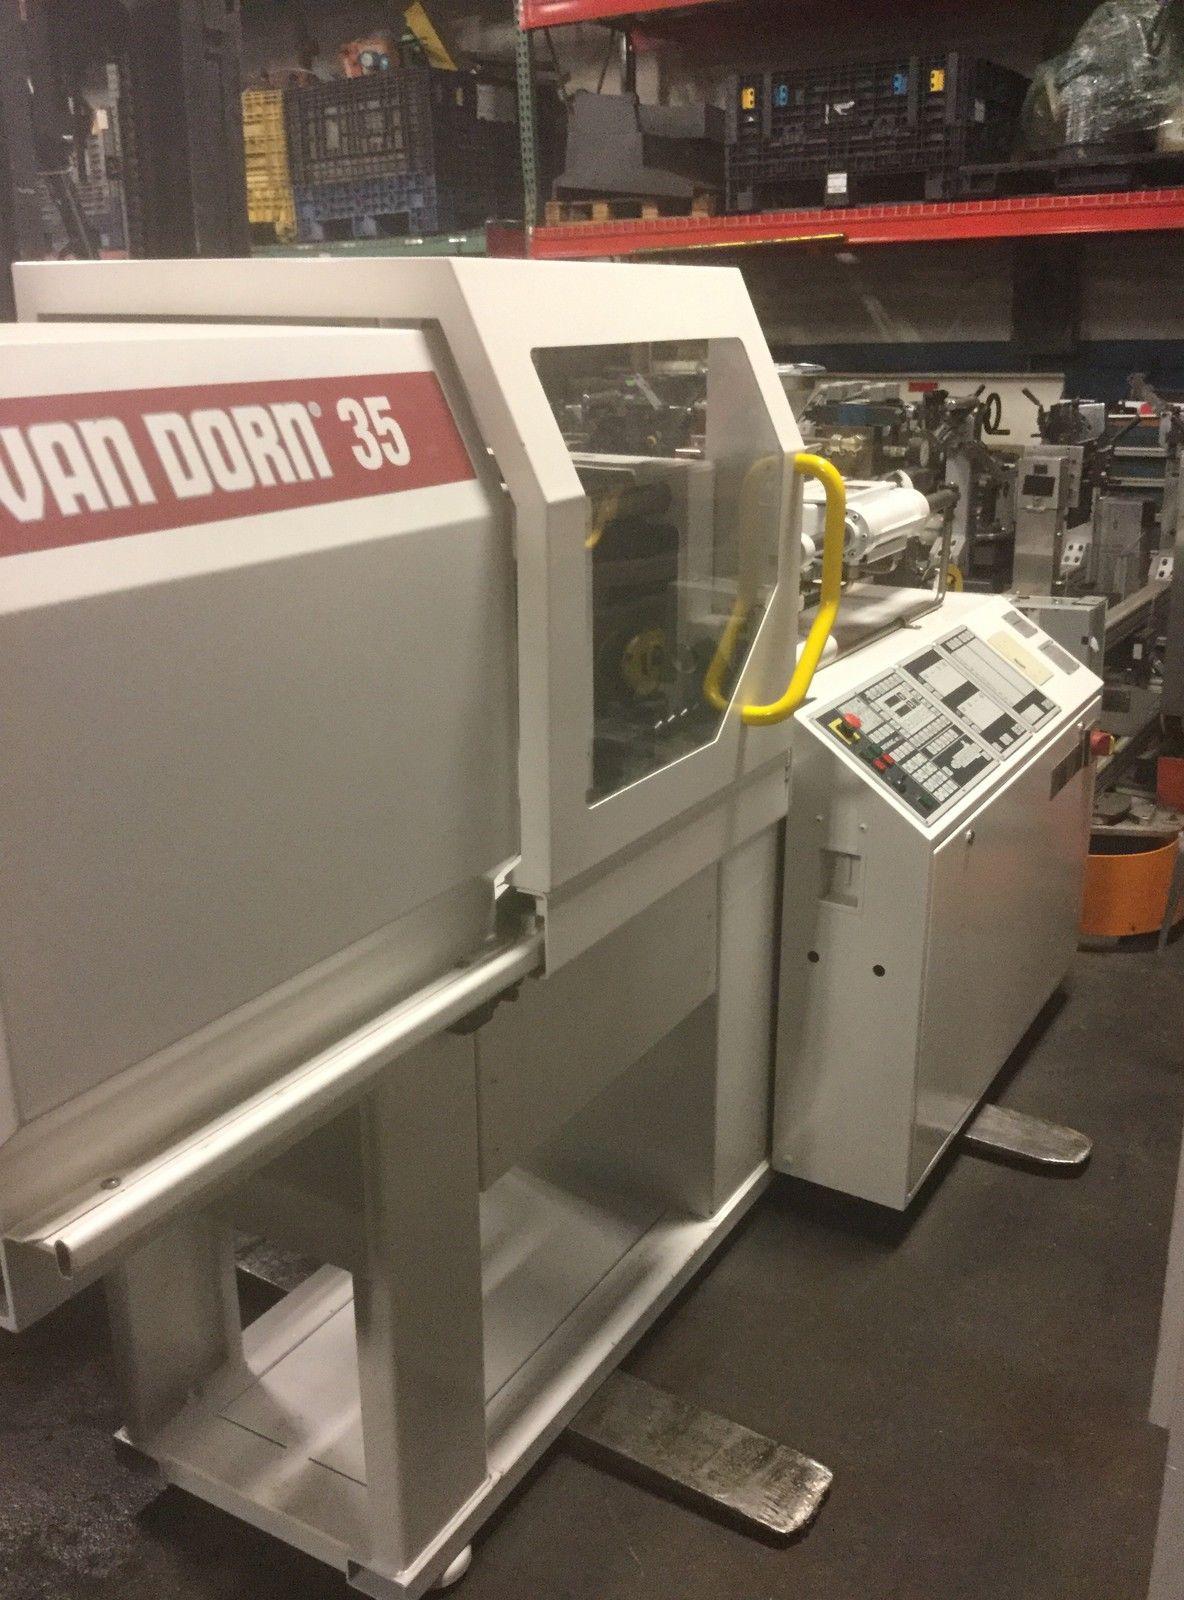 Lot 22 - 1995 Van Dorn Demag 35T ErgoTech 350-115 Plastic Injection Molding Machine - Sterling Heights, MI